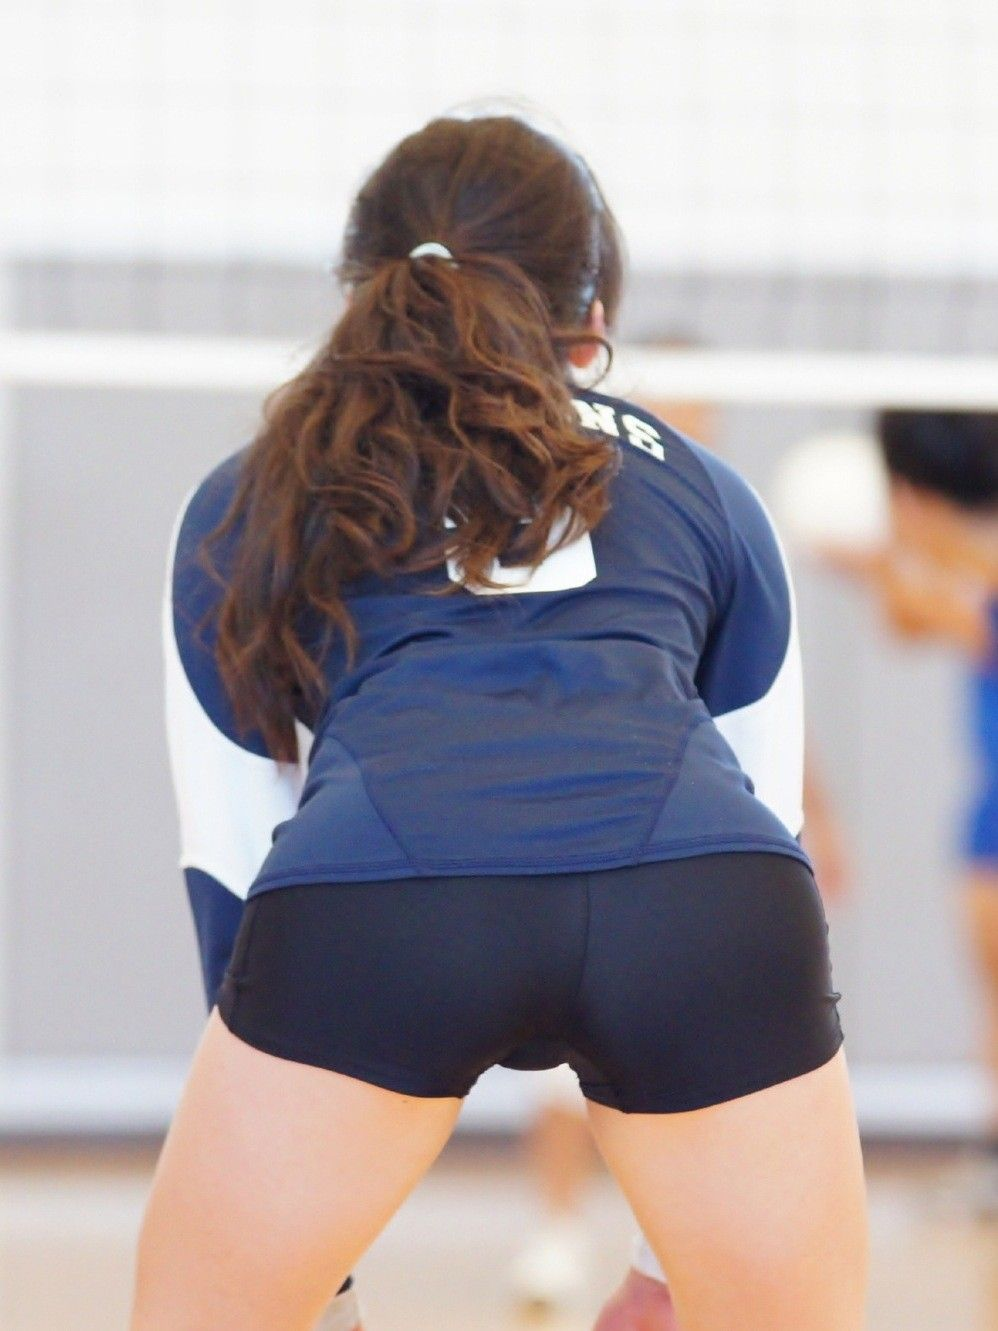 Skin Tight Female Athletes Women Volleyball Sporty Girls